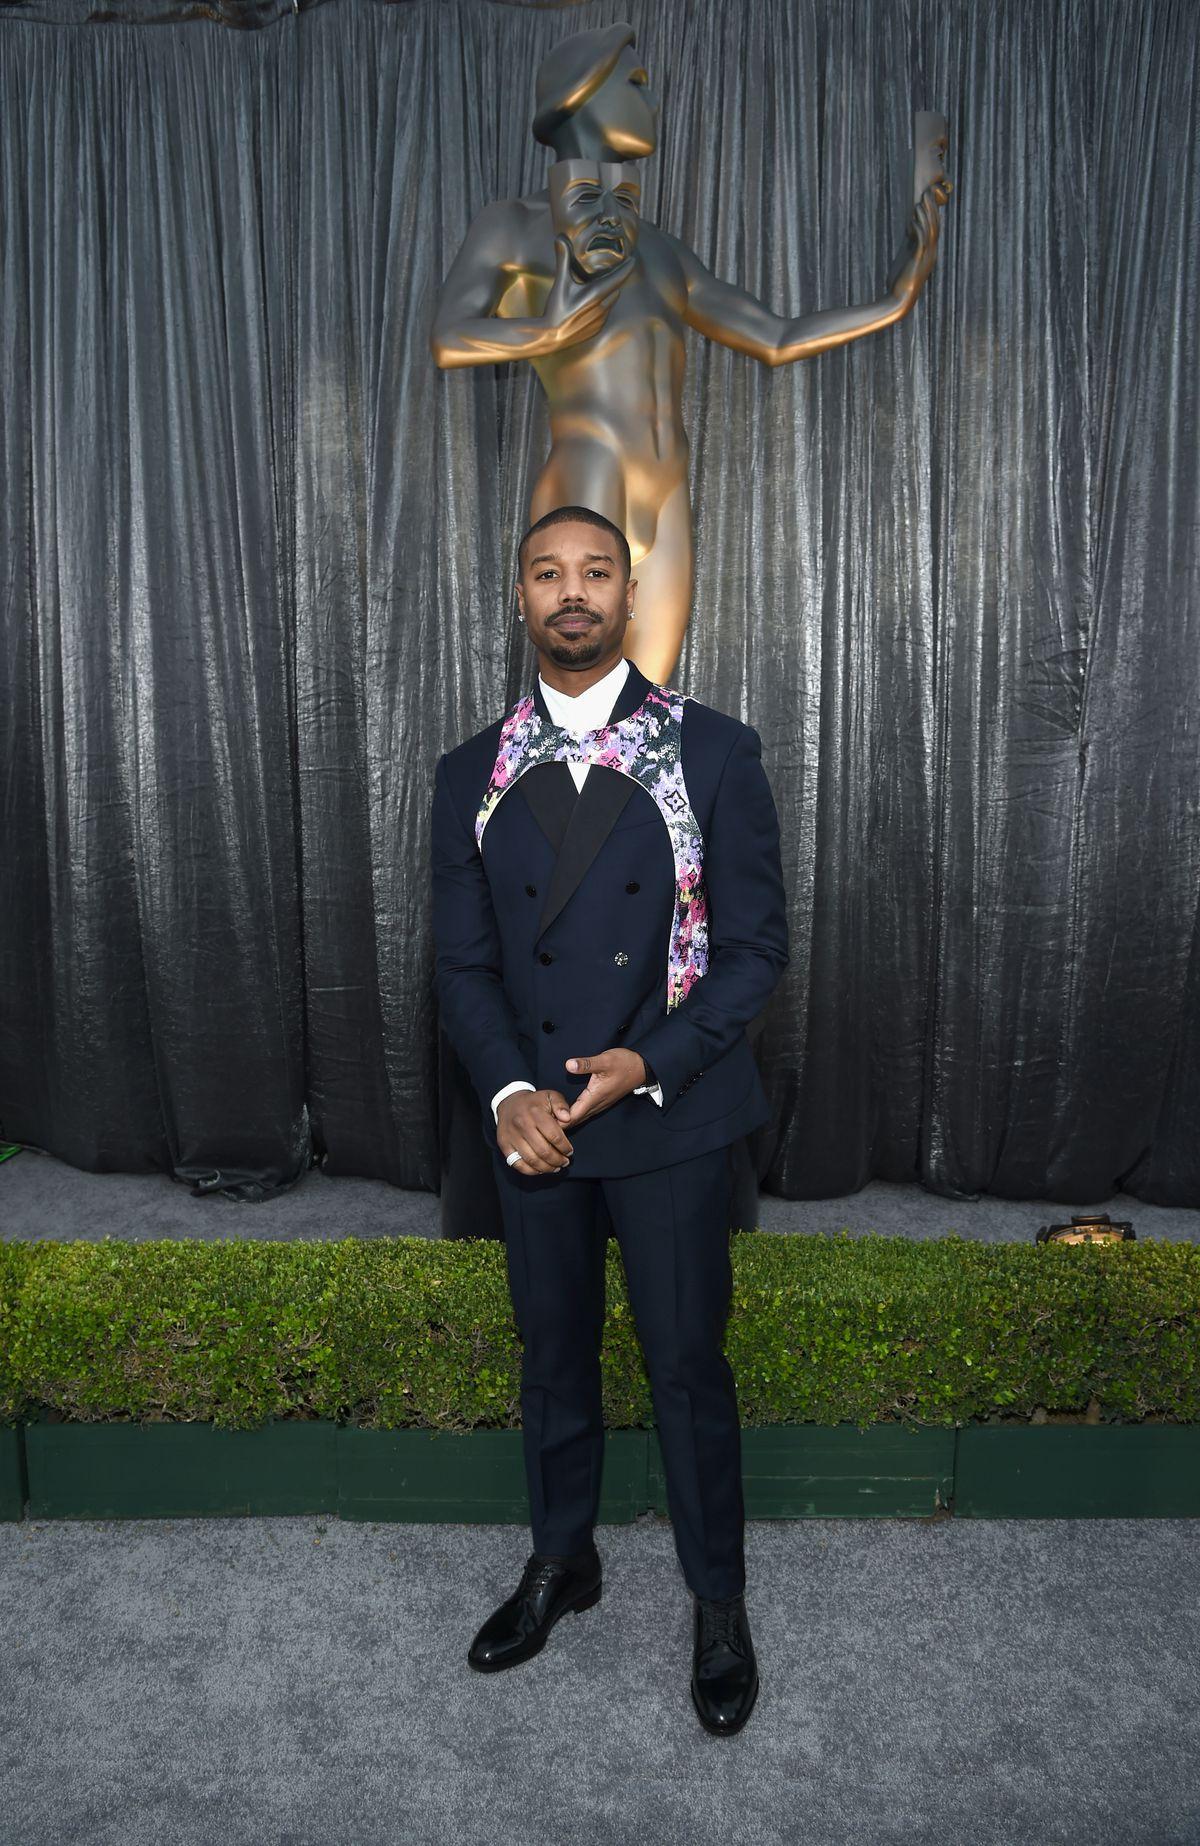 df61629988cb Michael B. Jordan at the 2019 SAG Awards in a Louis Vuitton harness.